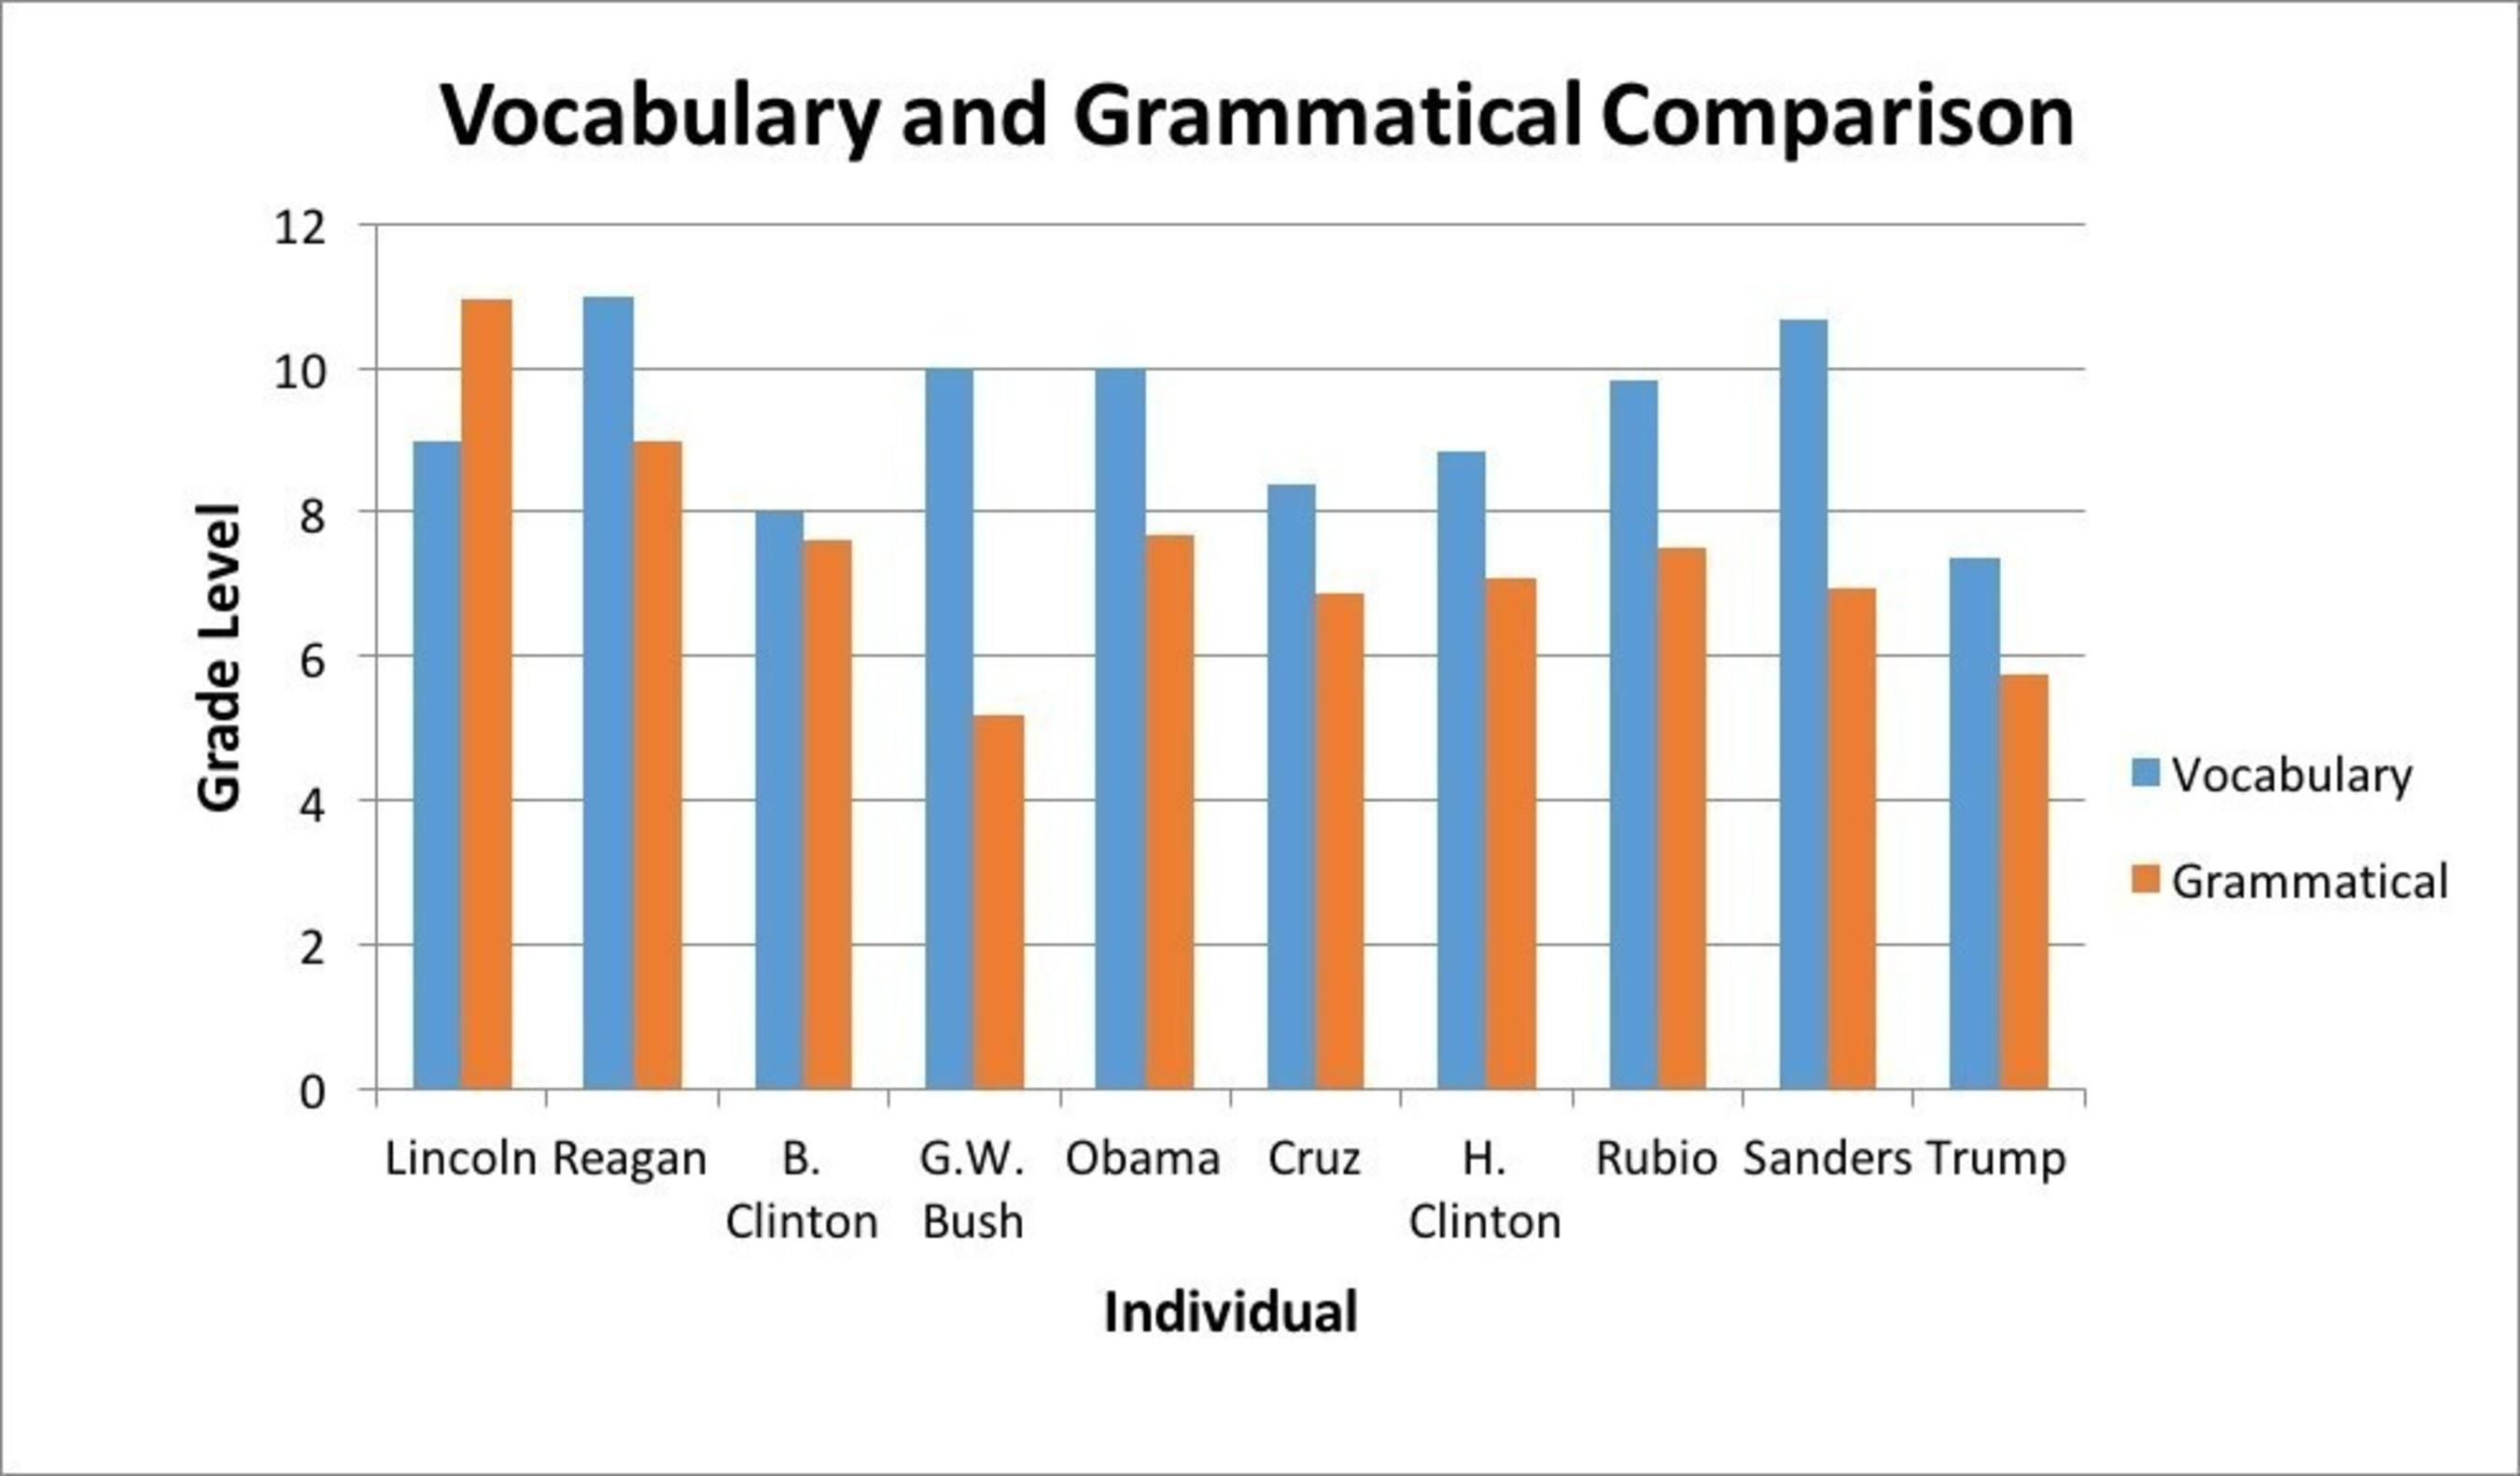 Vocabulary and Grammatical Comparison